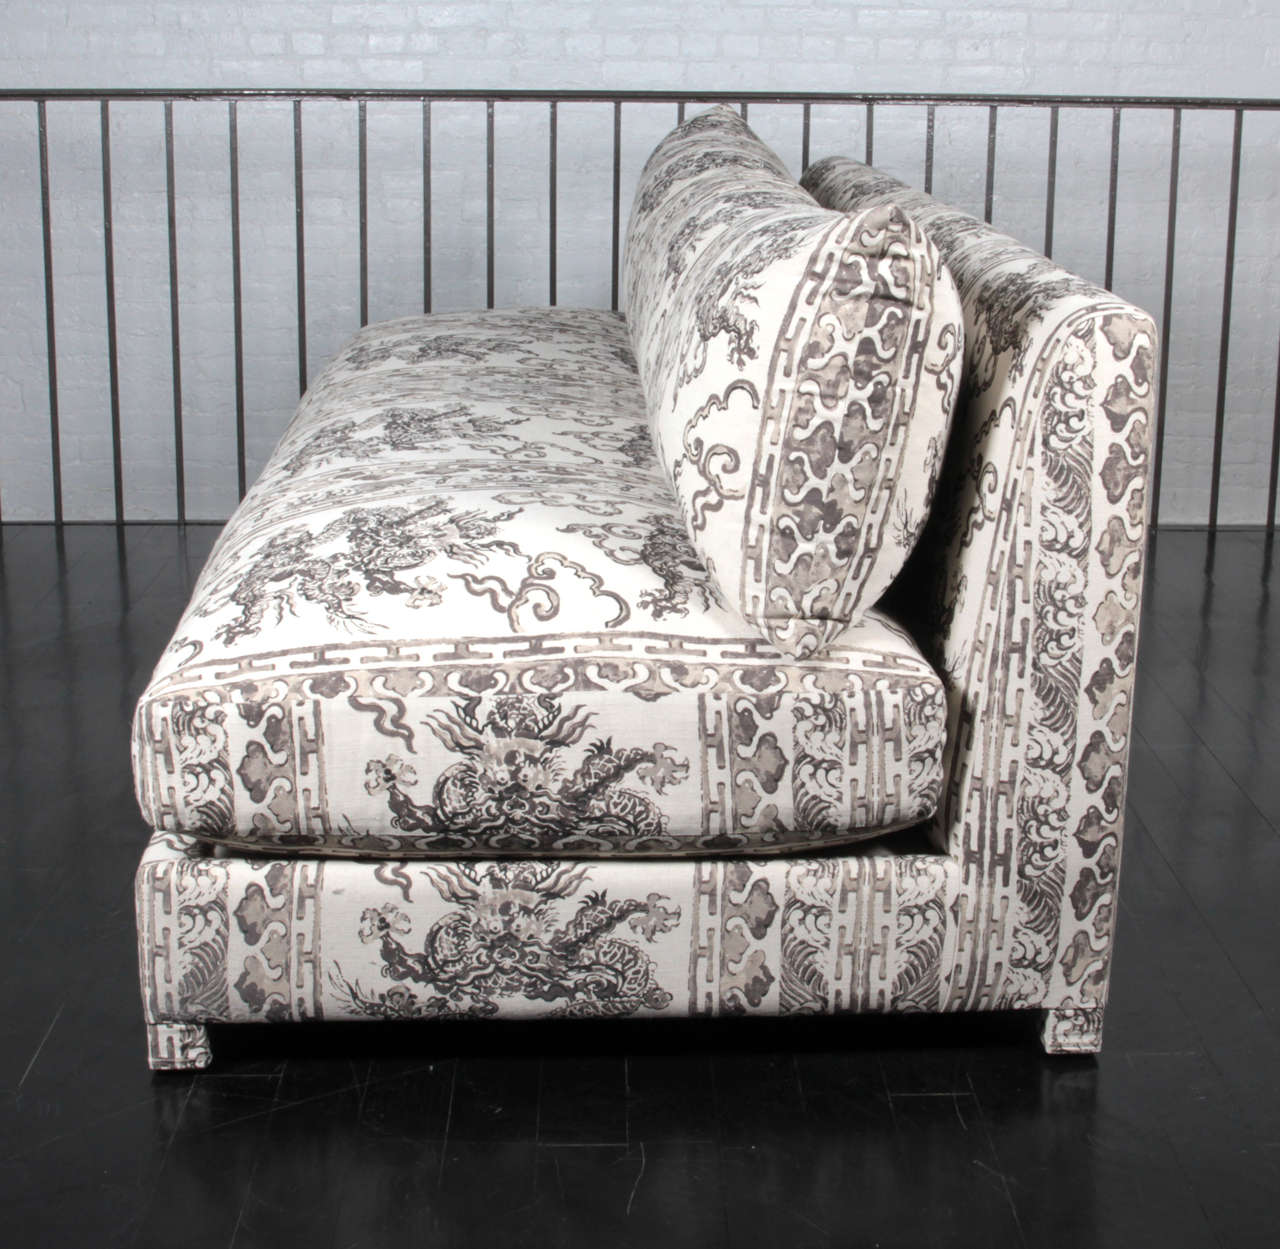 antony todd sofa walmart pillows armless upholstered in jim thompson hand